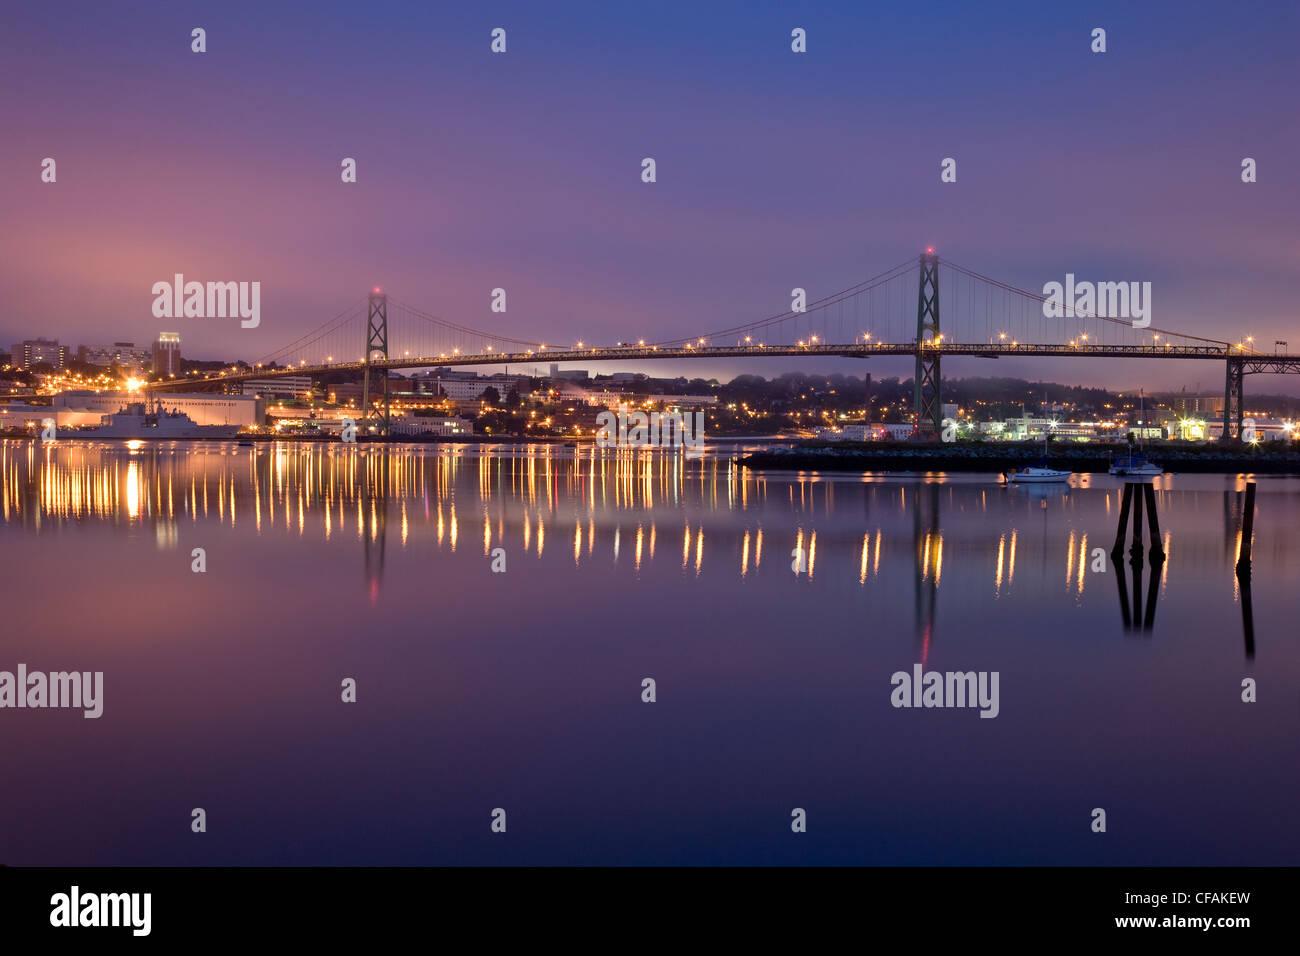 Angus L. Macdonald Bridge and Halifax Harbour, Halifax, Nova Scotia, Canada - Stock Image